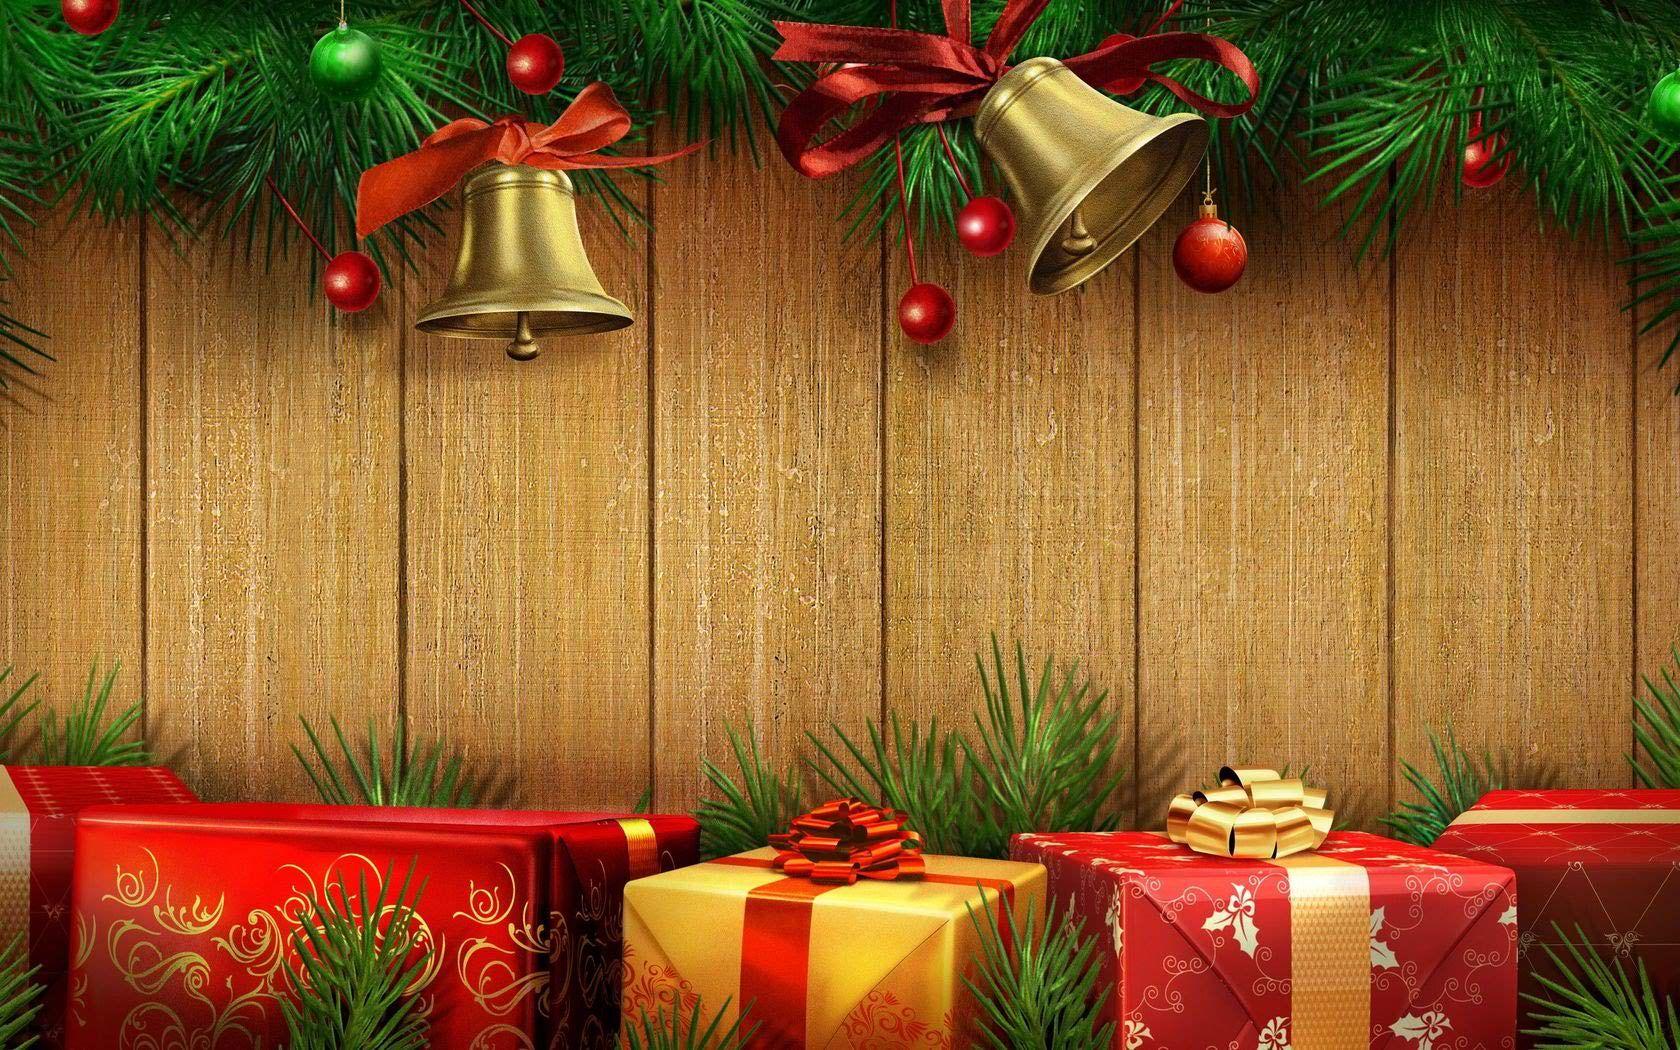 Merry Christmas Jingle Bells Wallpapers Hd Creative Merry